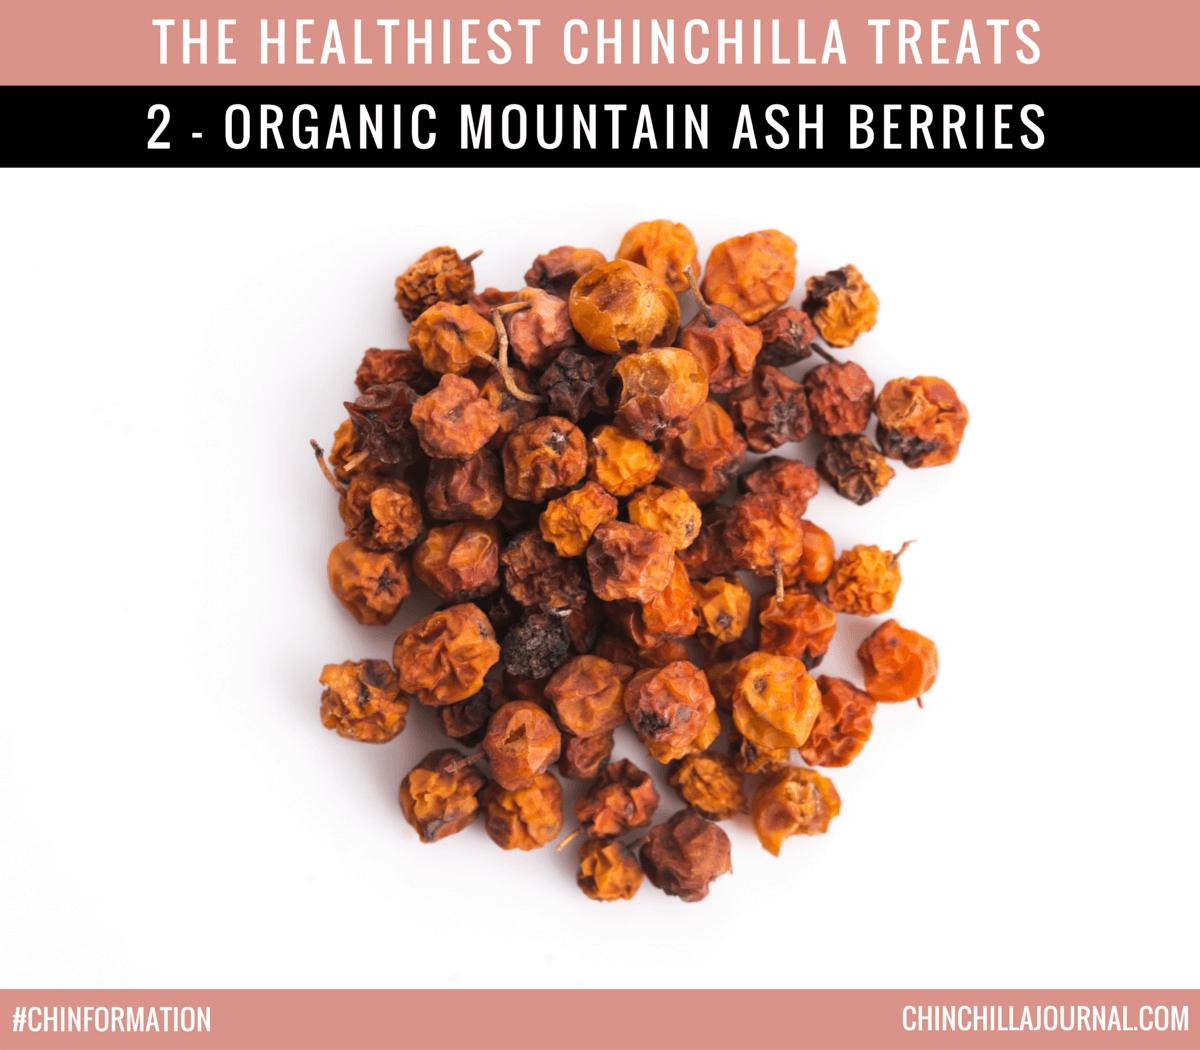 The Healthiest Chinchilla Treats - 2 - Organic Mountain Ash Berries